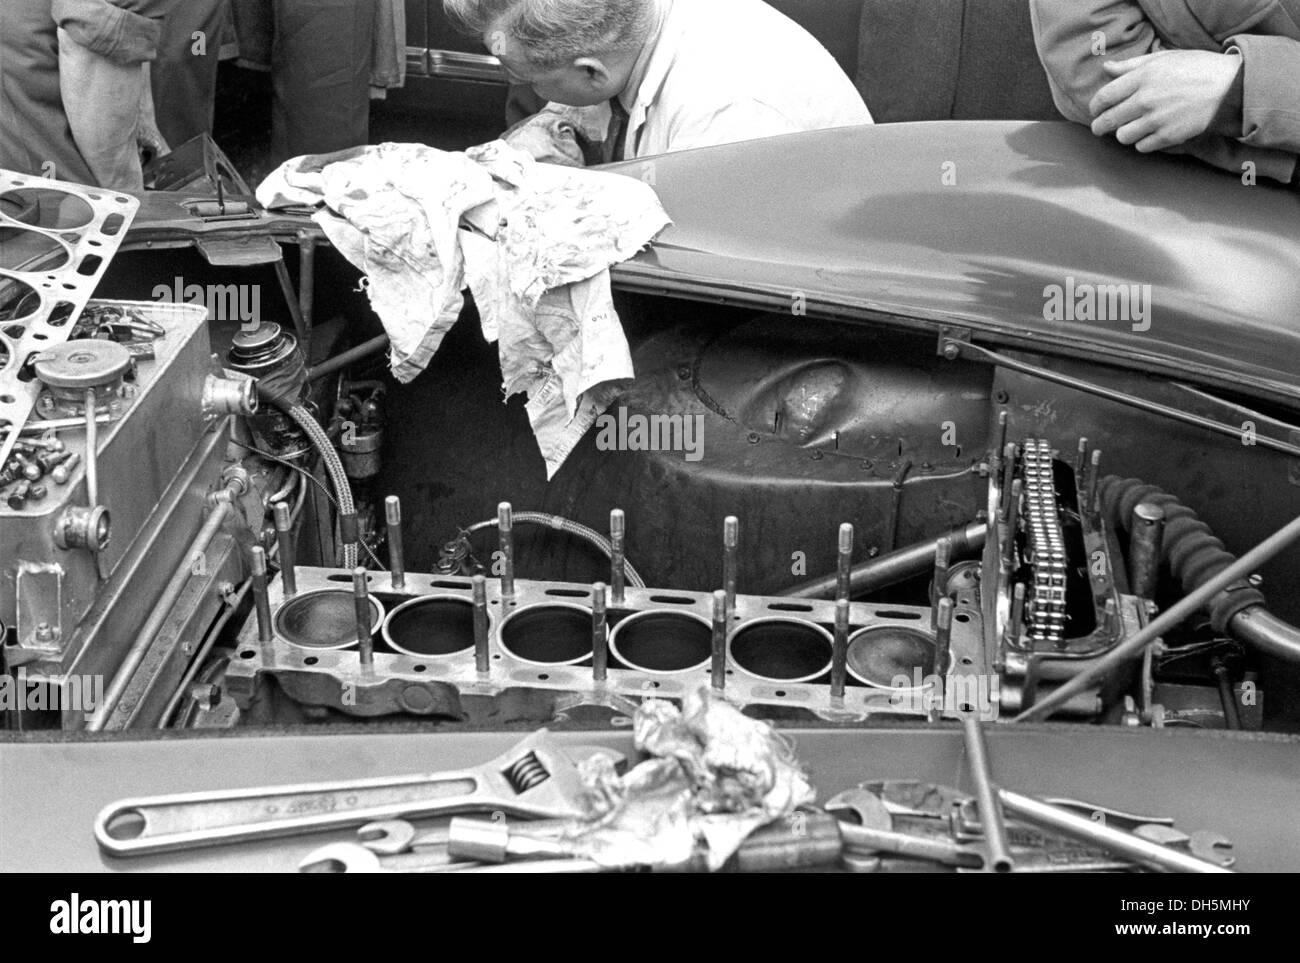 Mechaniker arbeiten auf einem Aston Martin DB3S Dundrod TT, Nordirland 1953. Stockbild